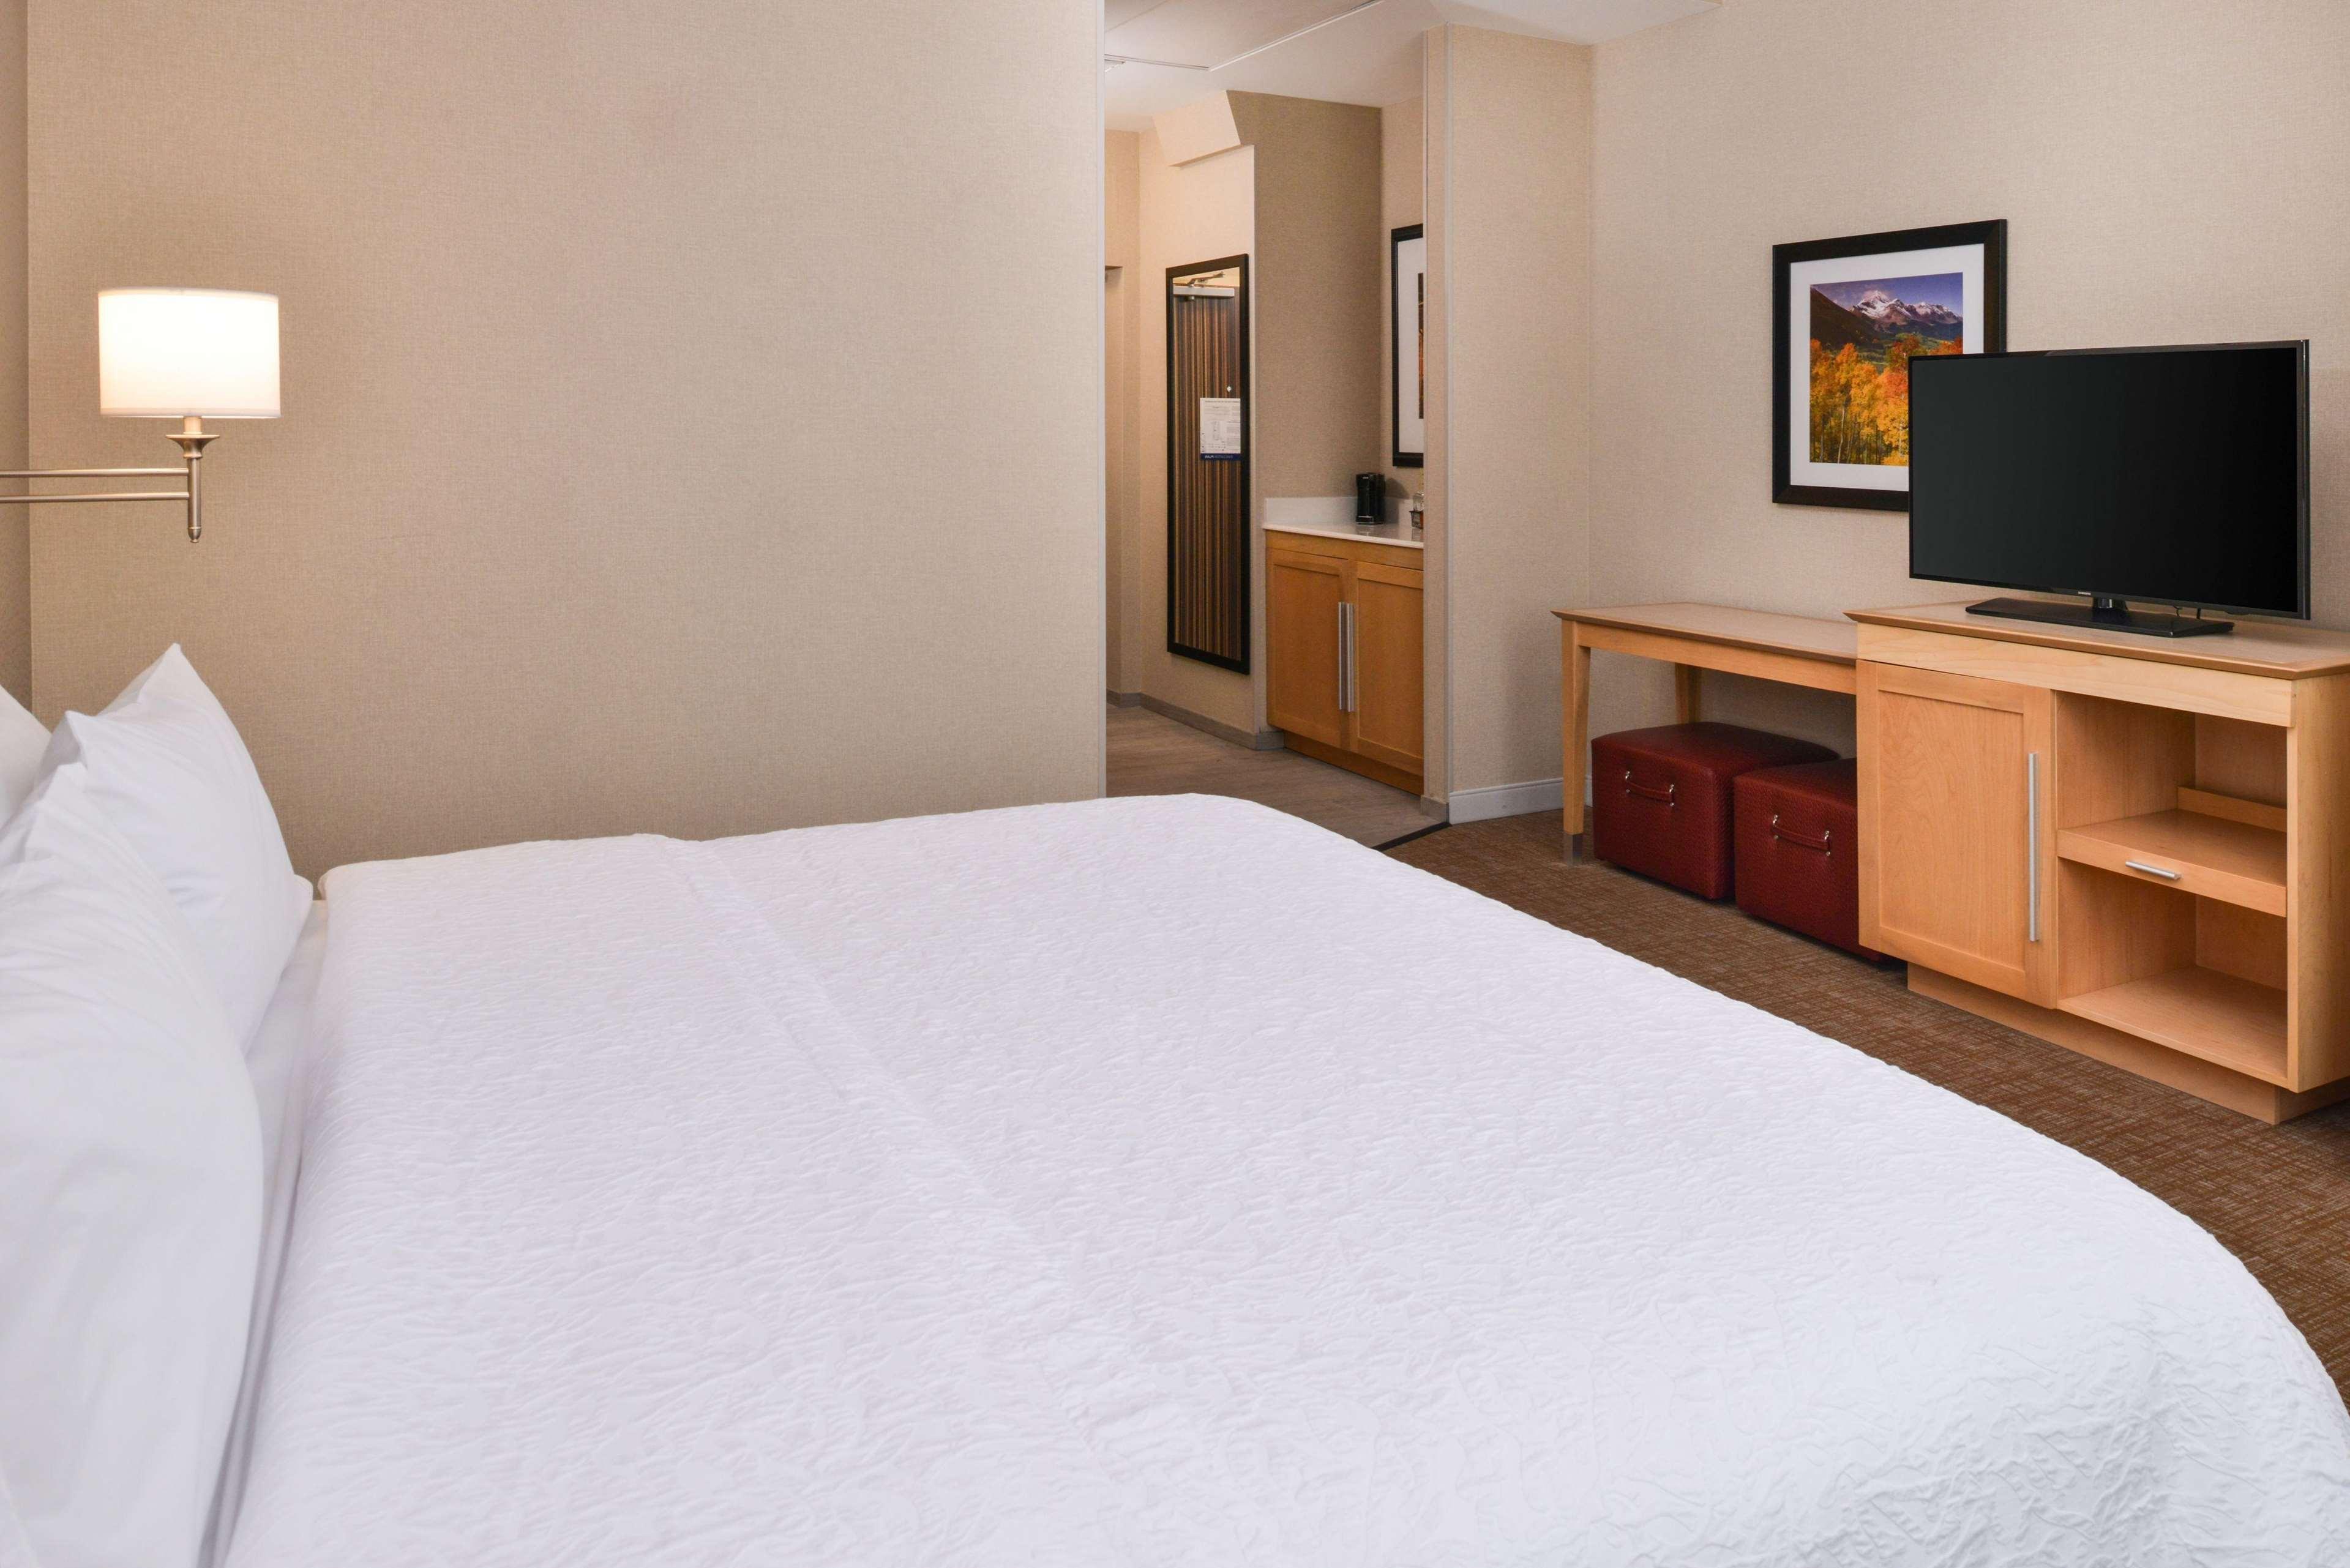 Hampton Inn & Suites Denver-Speer Boulevard image 18